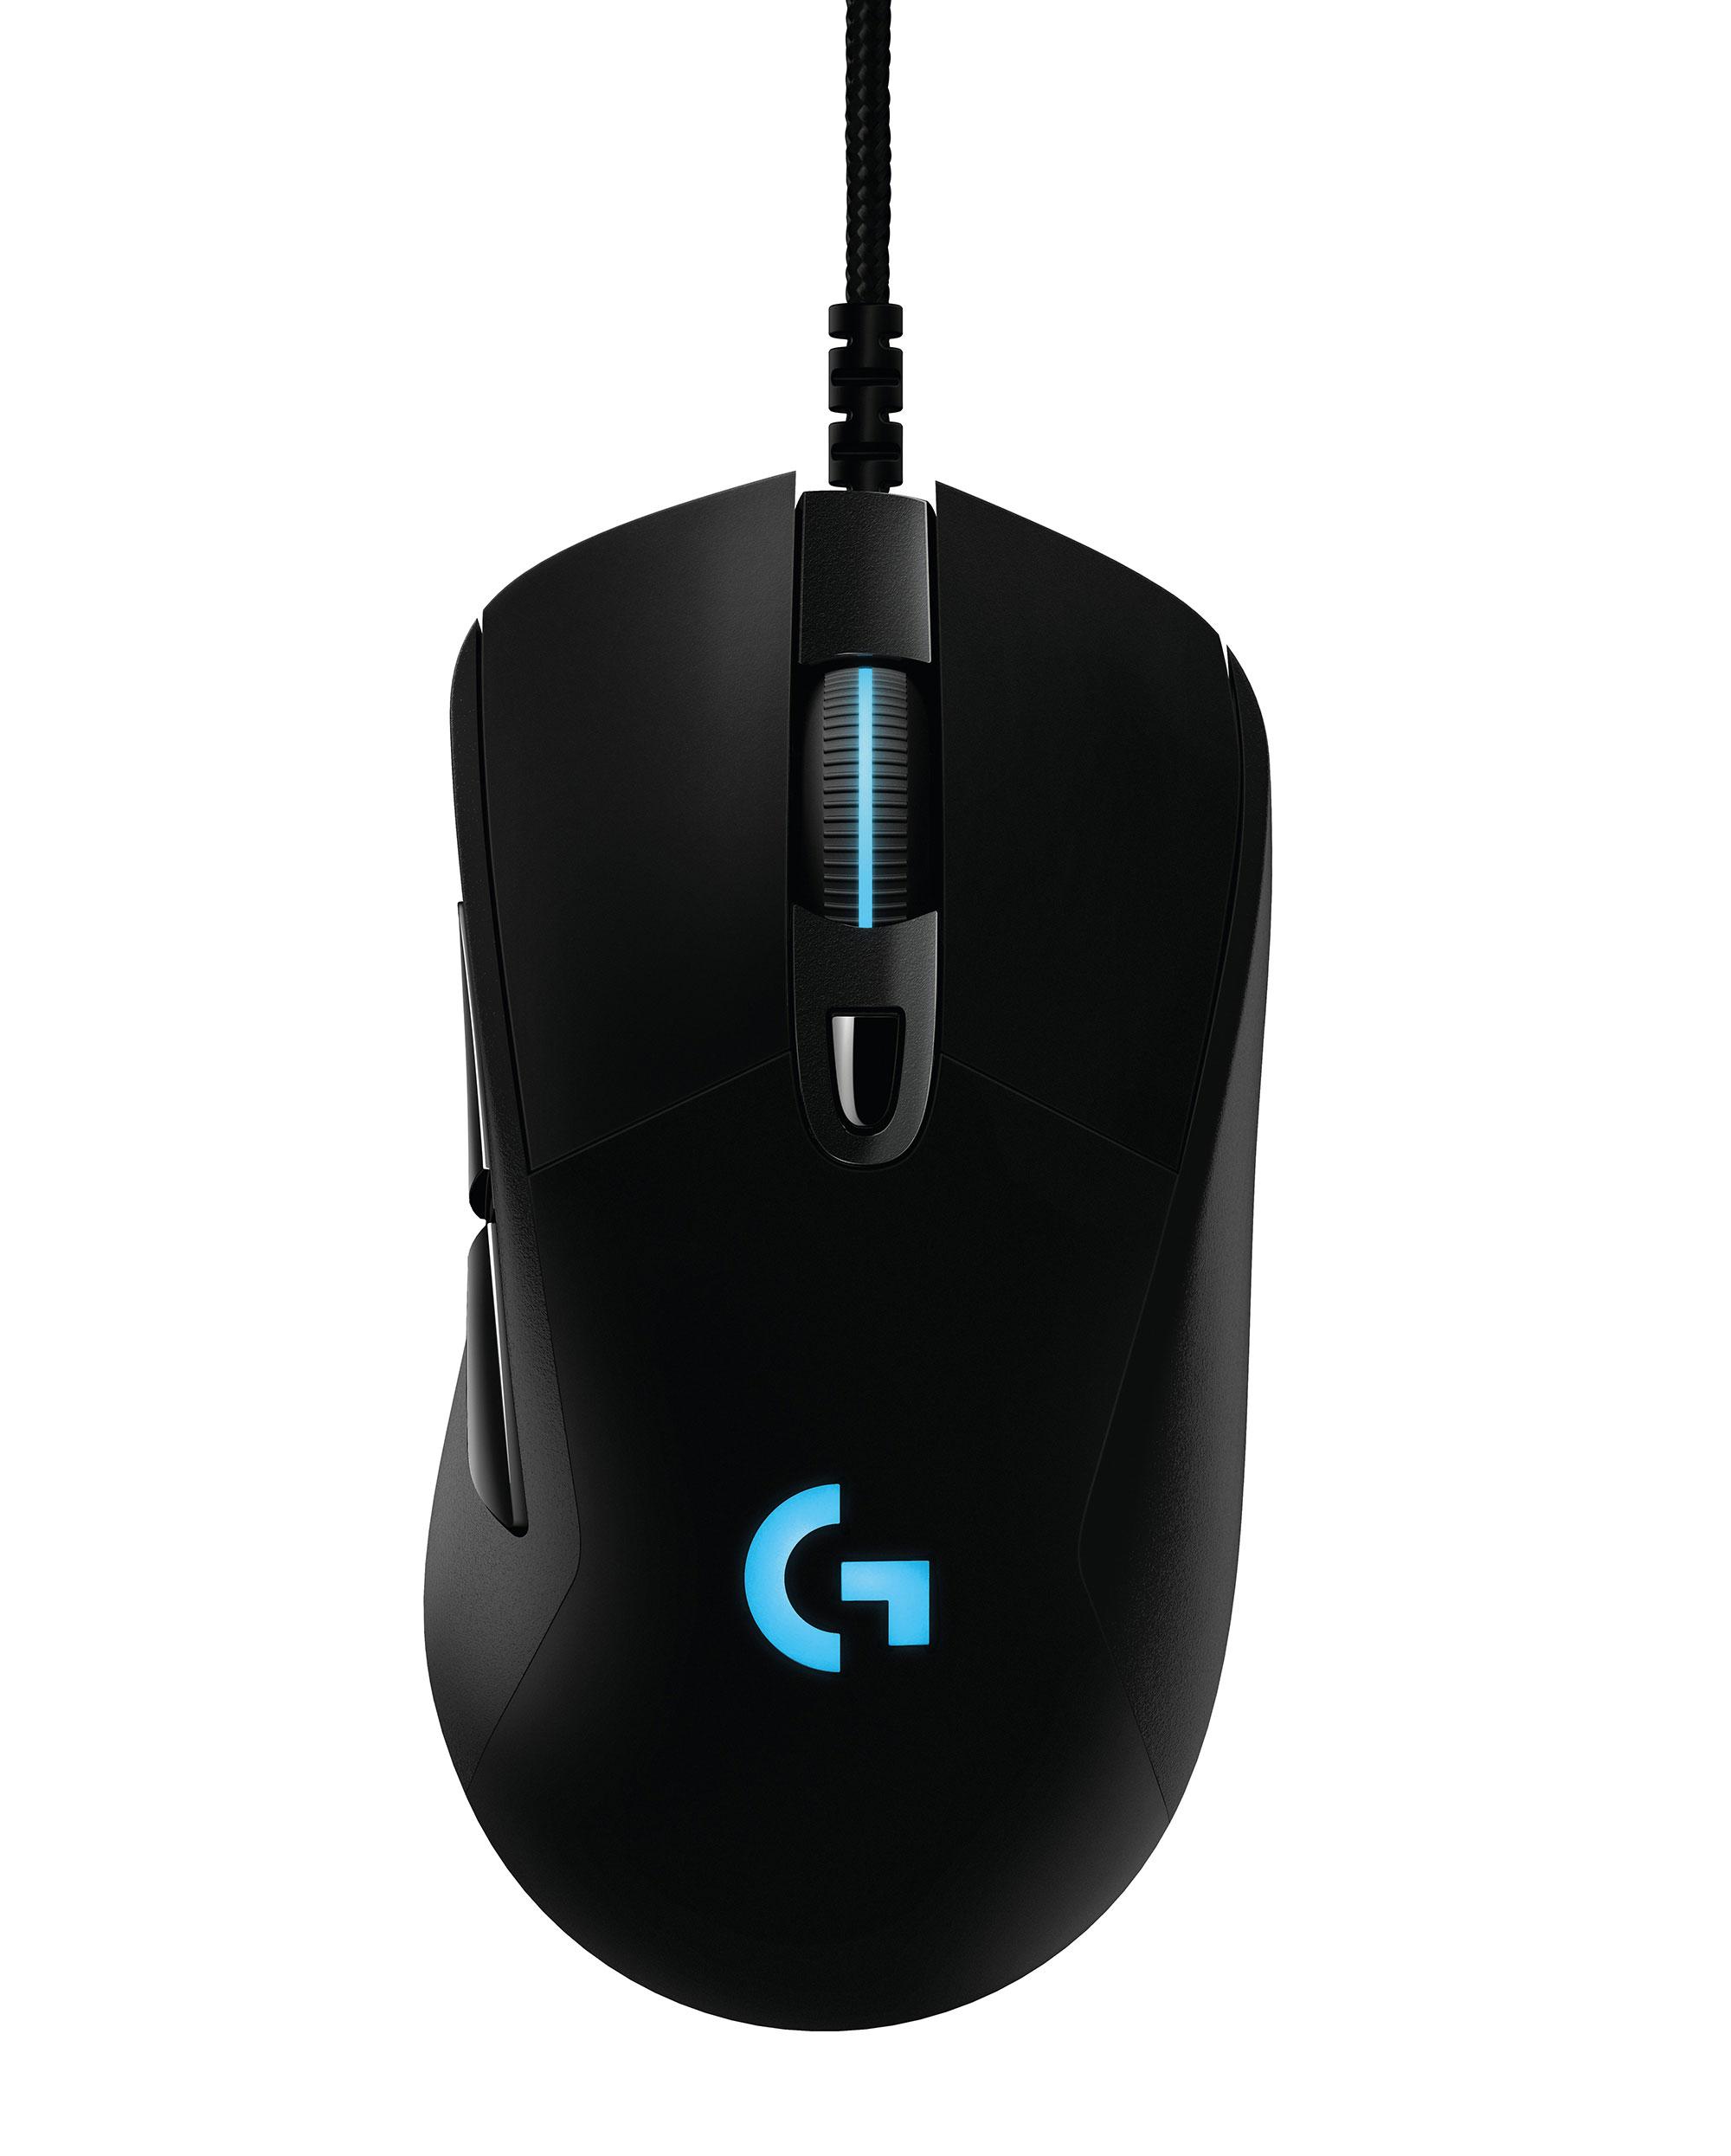 g403-wired.jpg